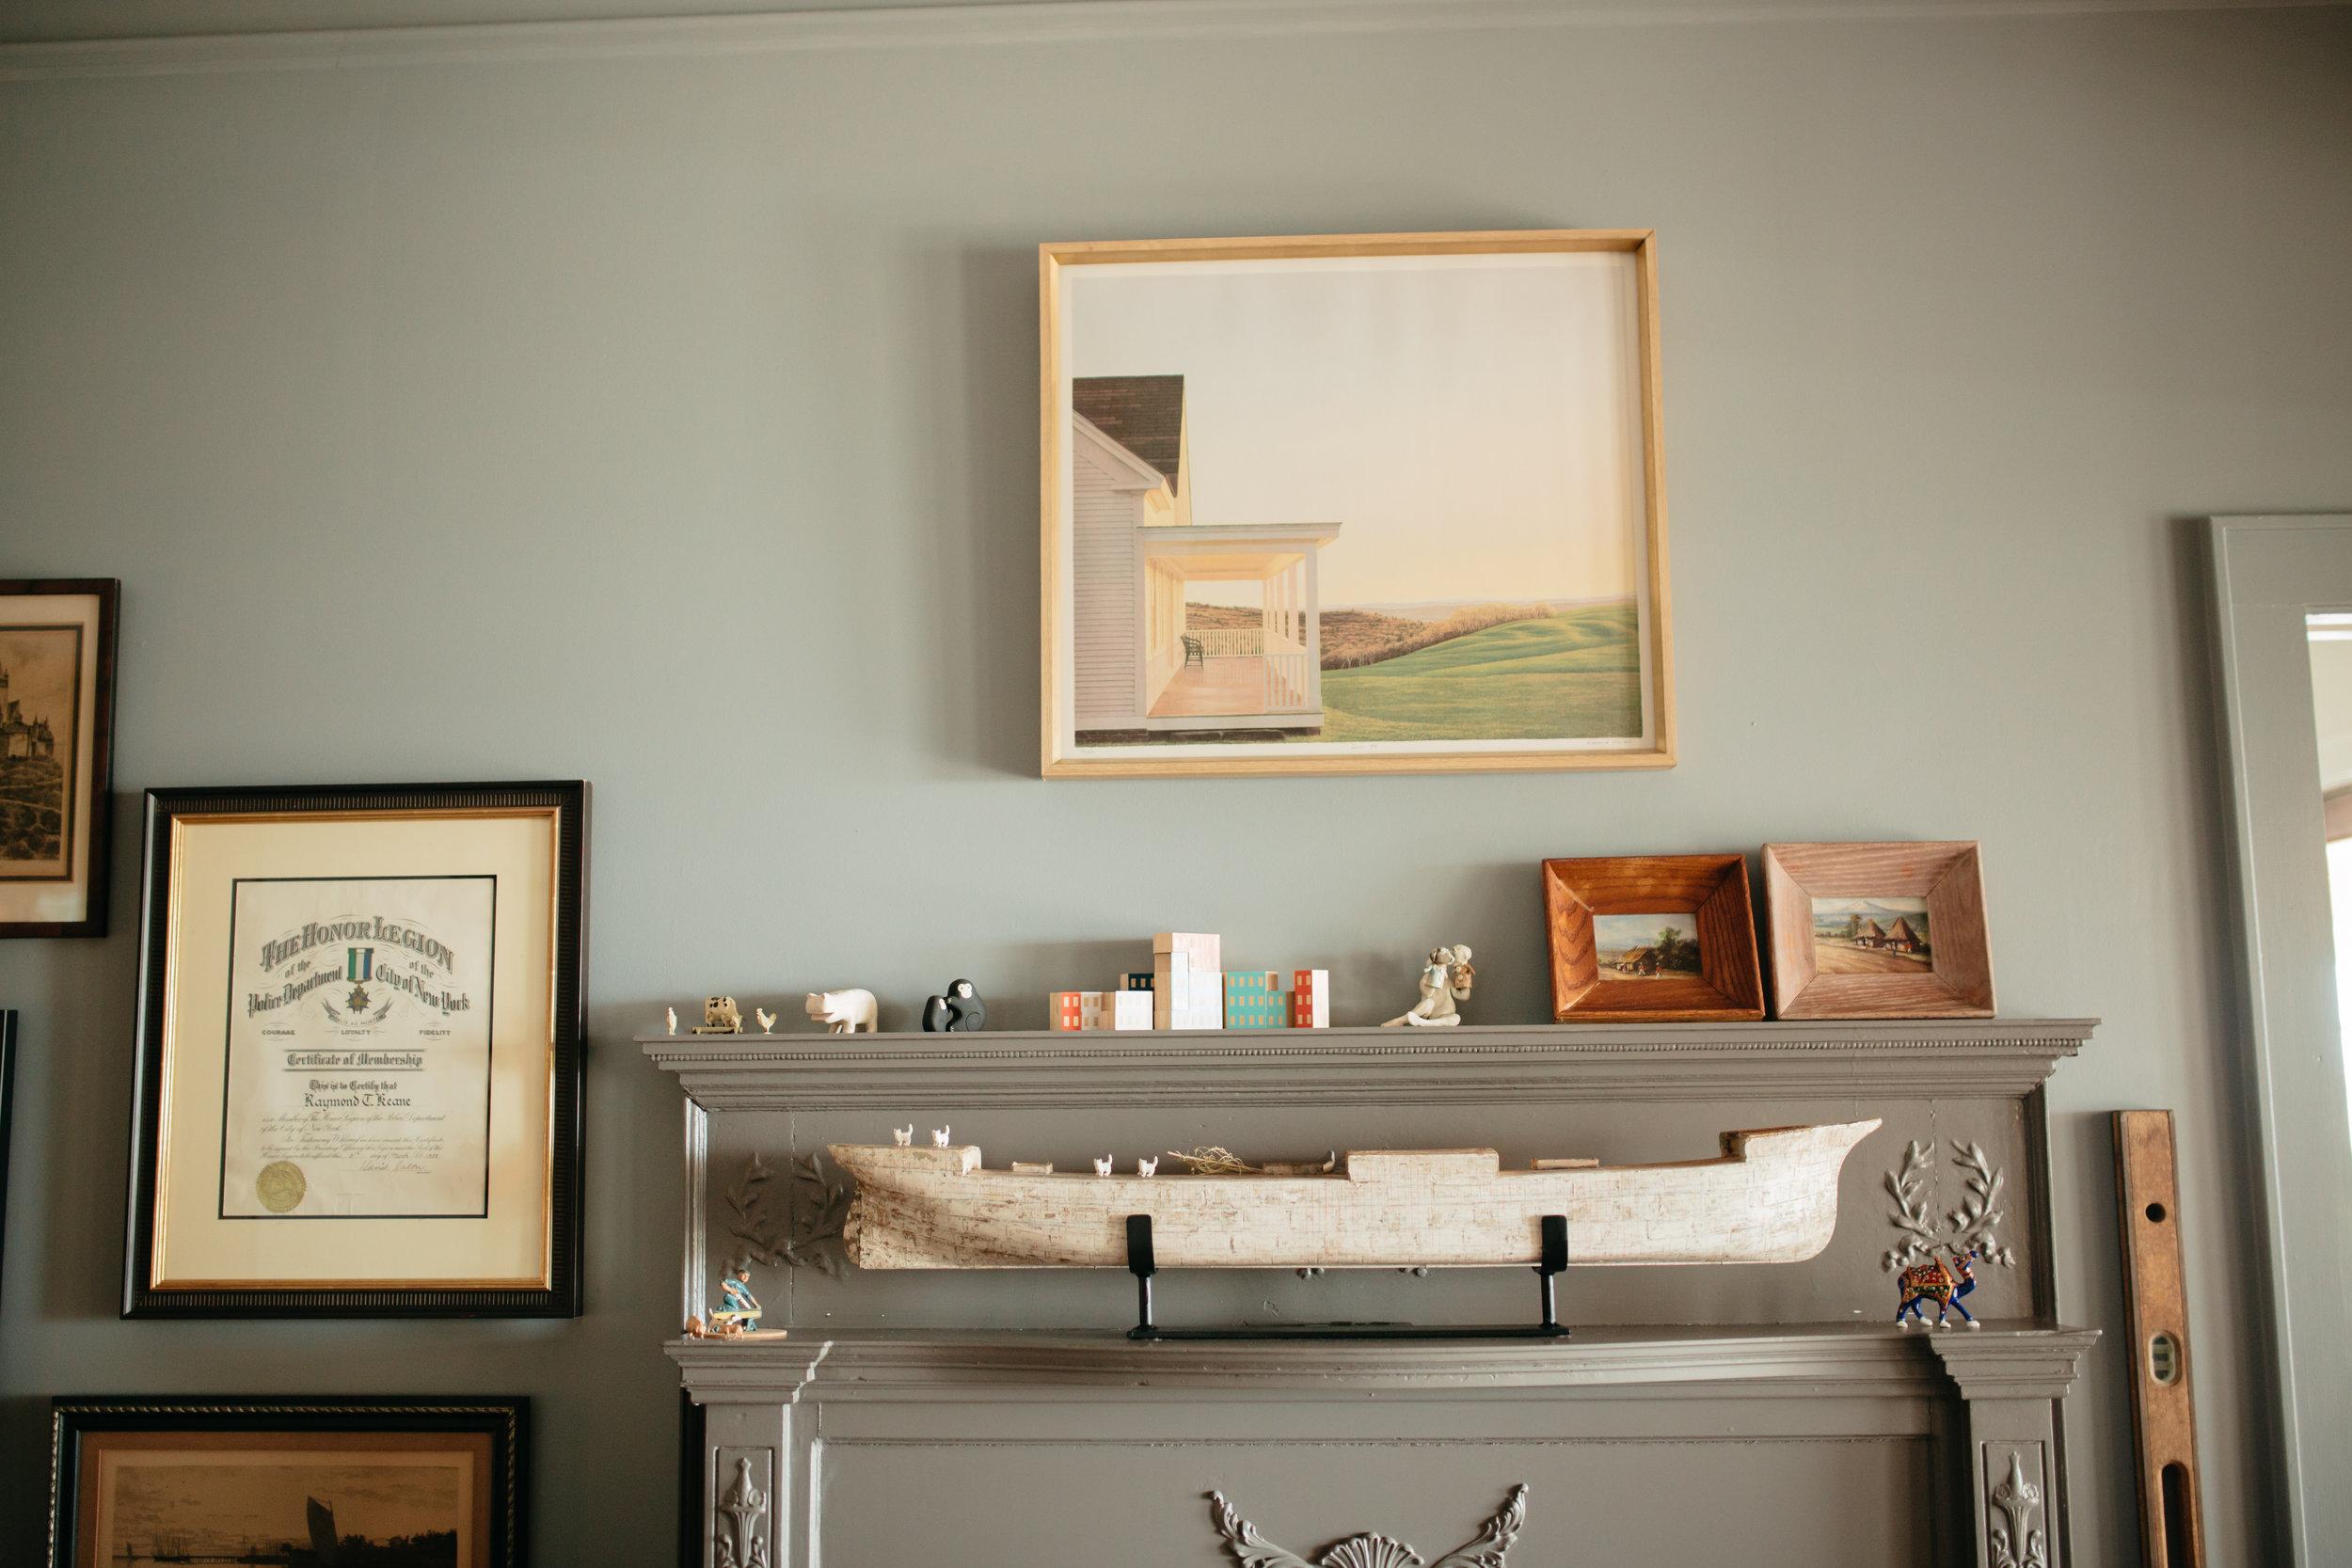 paraiso-event-design-charleston-mount-pleasant-waterfront-wedding-private-home-02.jpg